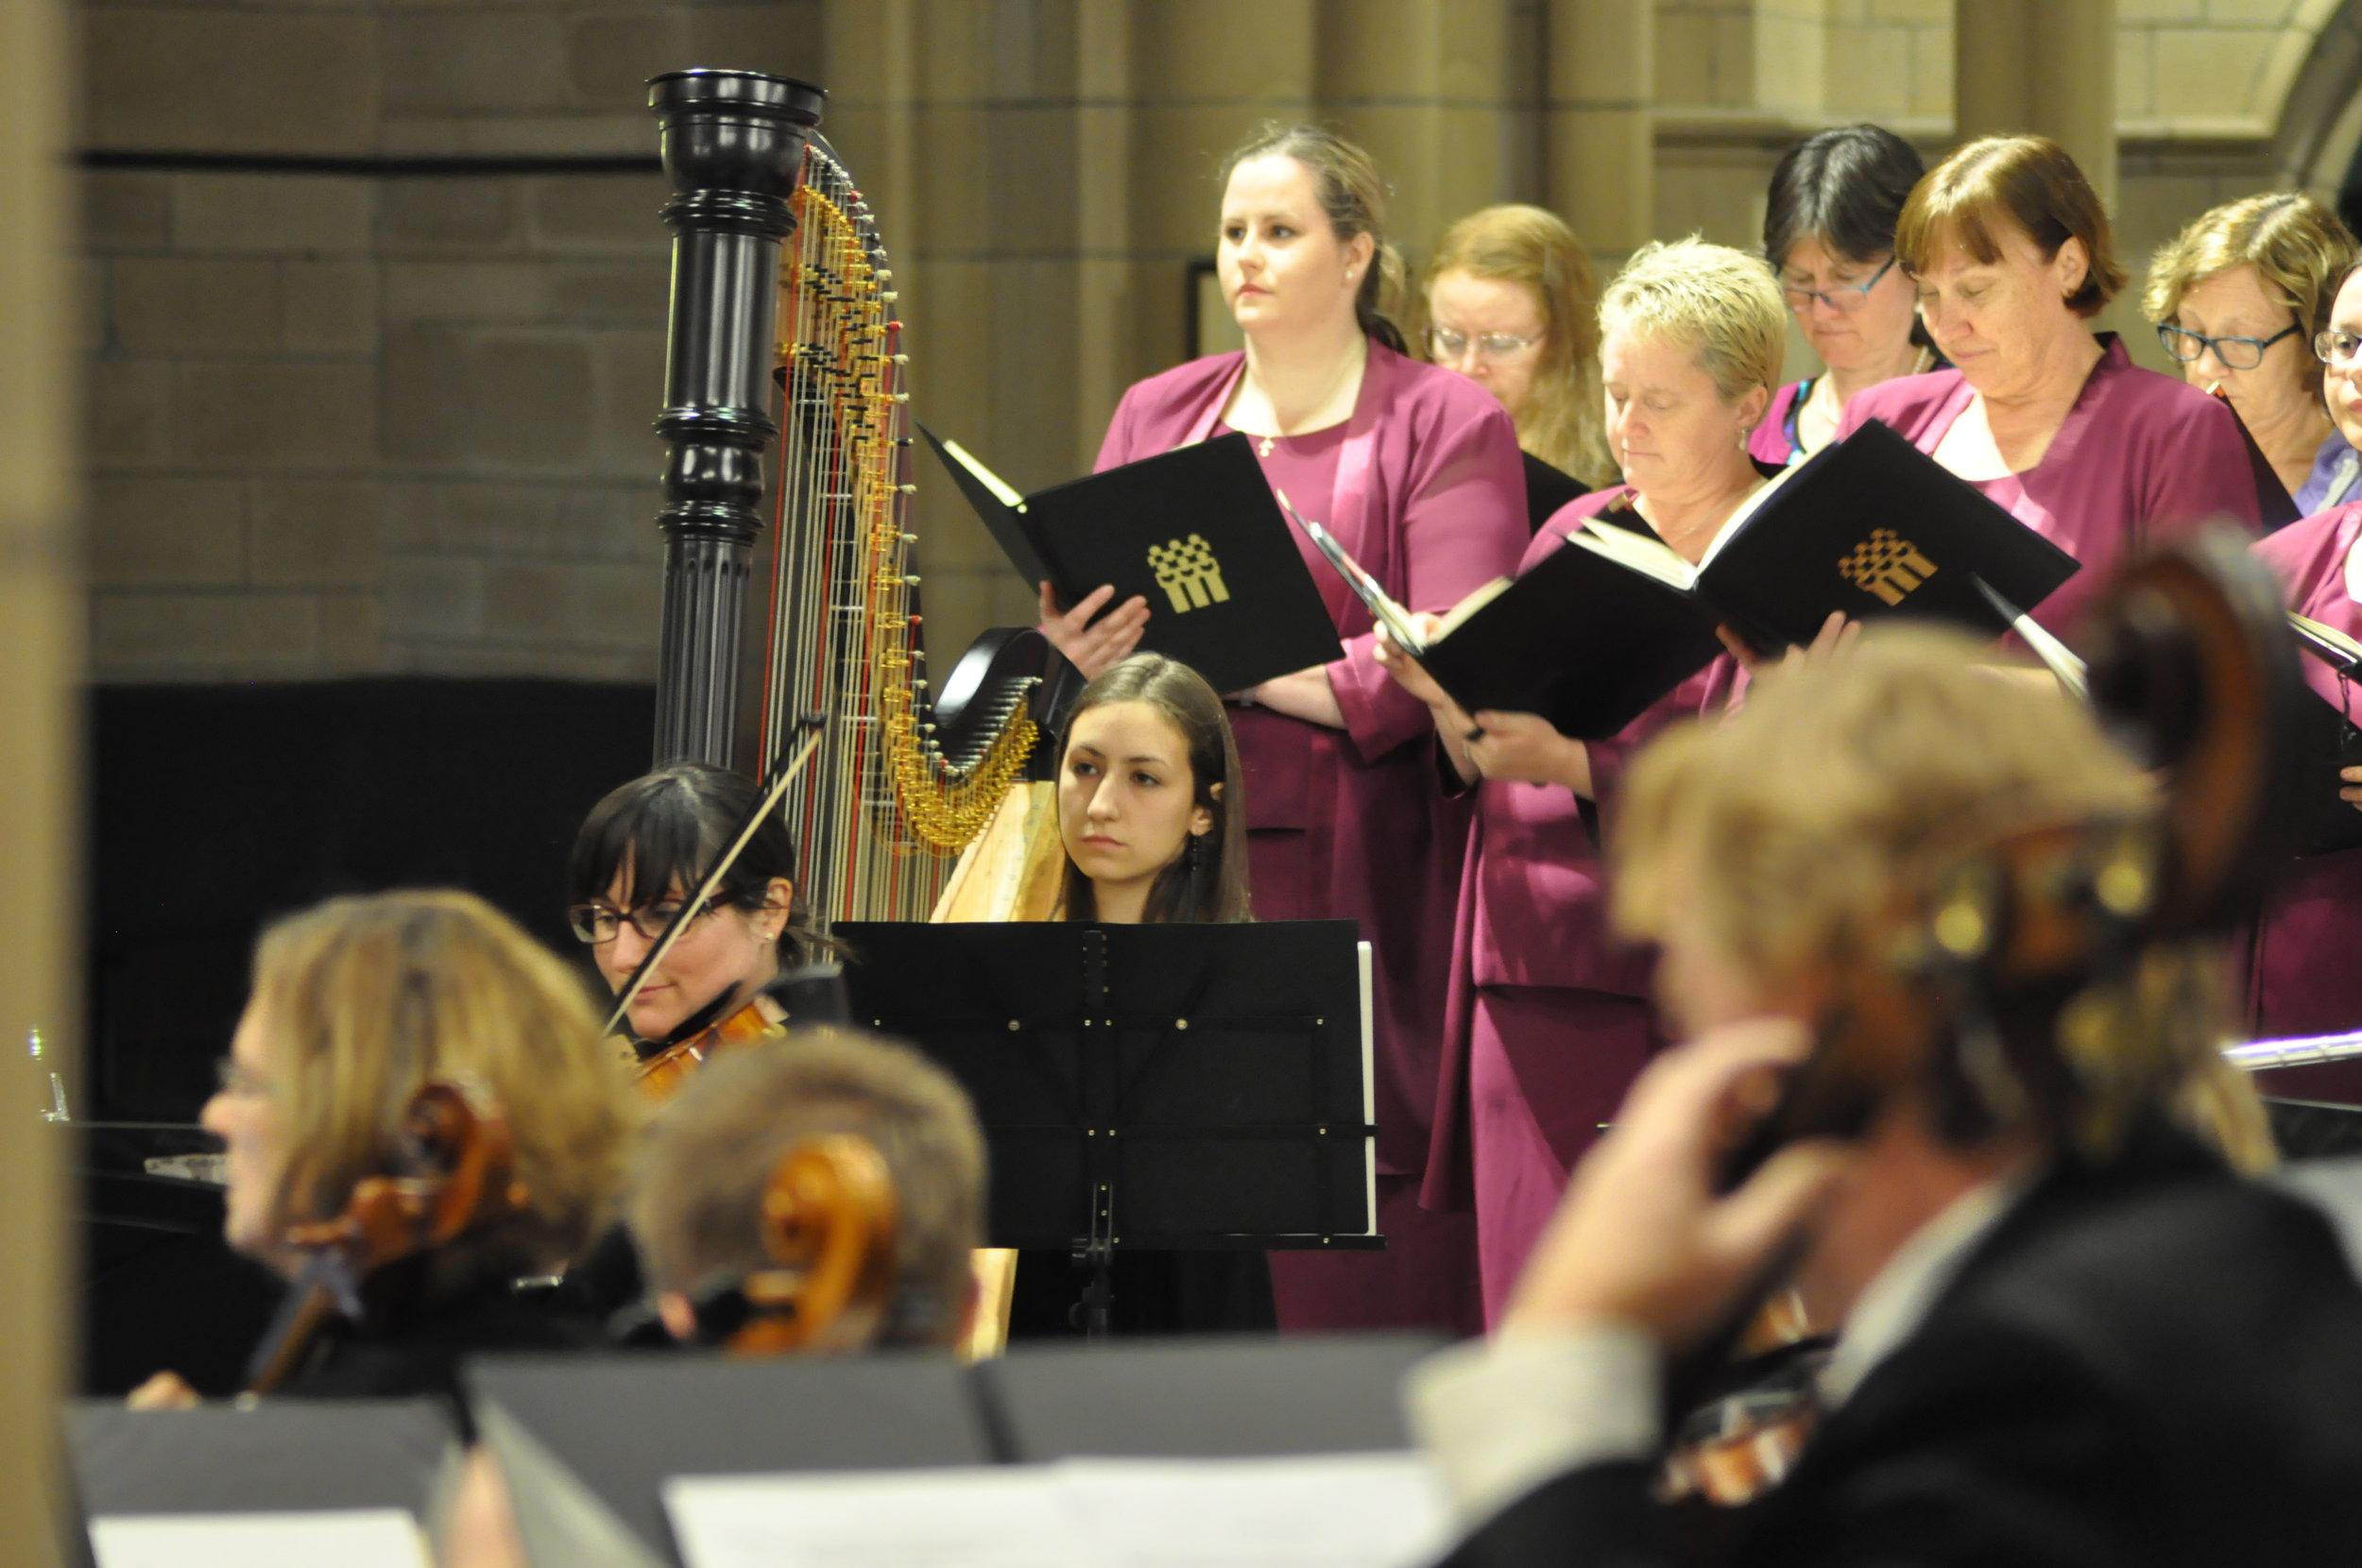 Concert with Qld Choir, 2017